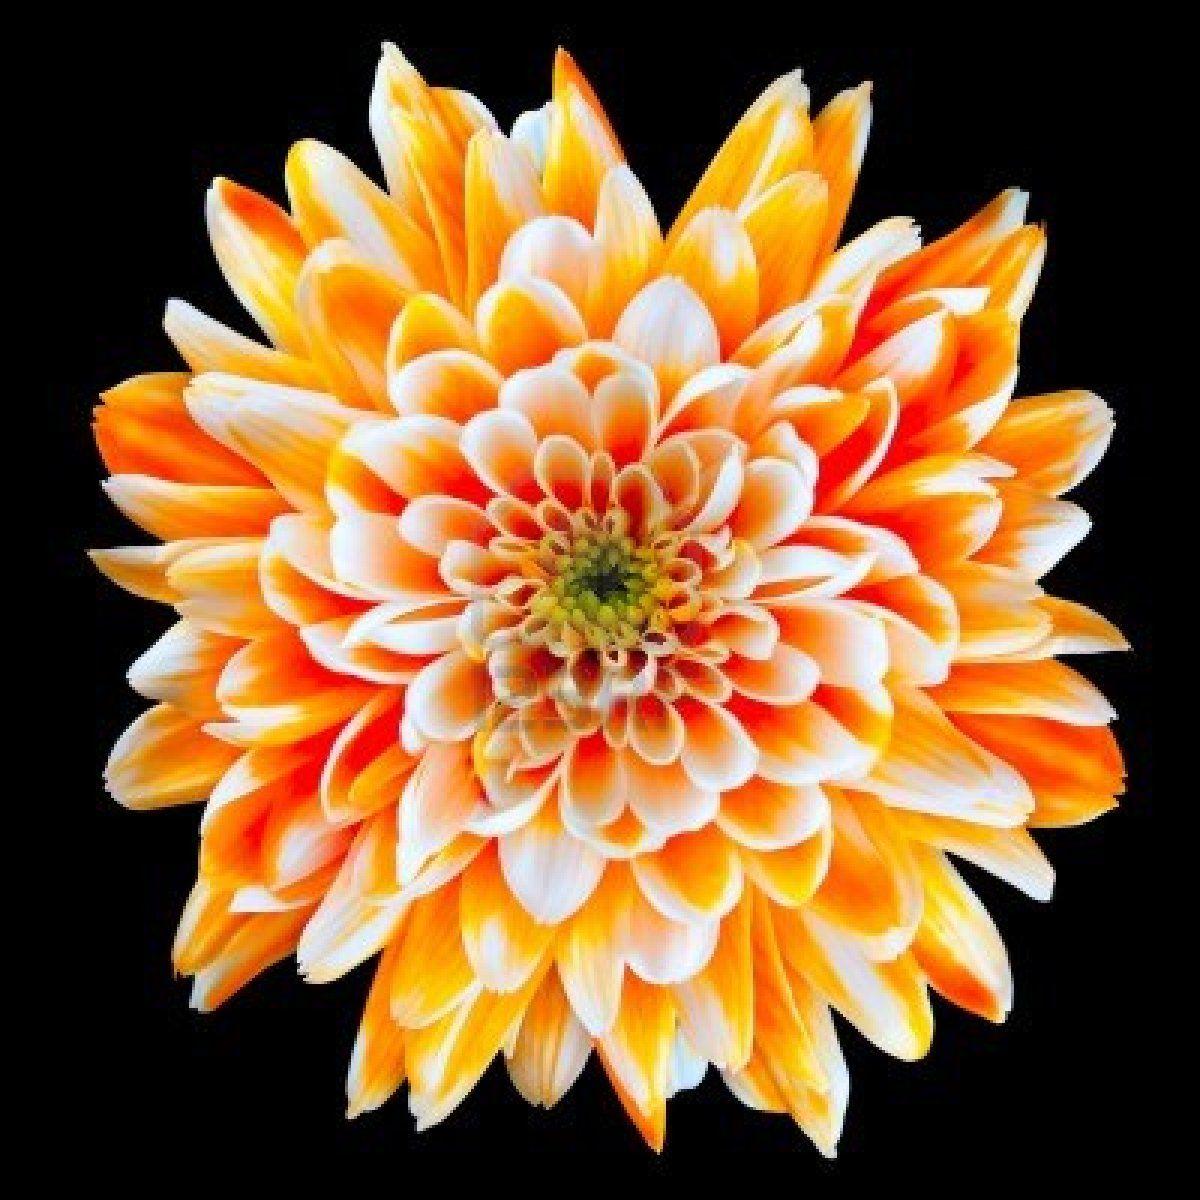 Stock Photo Birth flower tattoos, Chrysanthemum flower